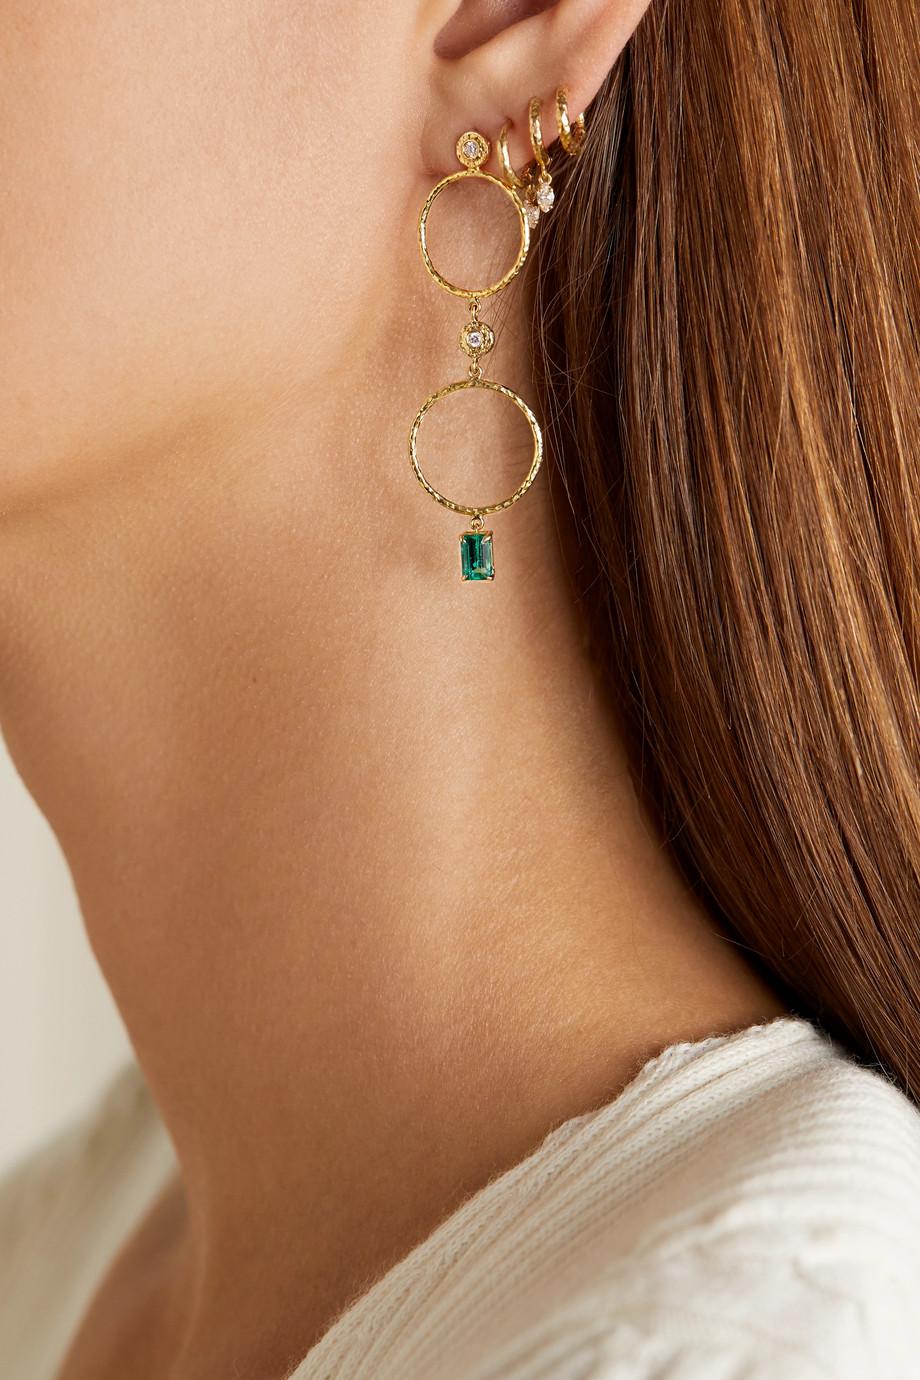 Octavia Elizabeth + NET SUSTAIN Nesting Gem 18-karat gold, emerald and diamond earrings